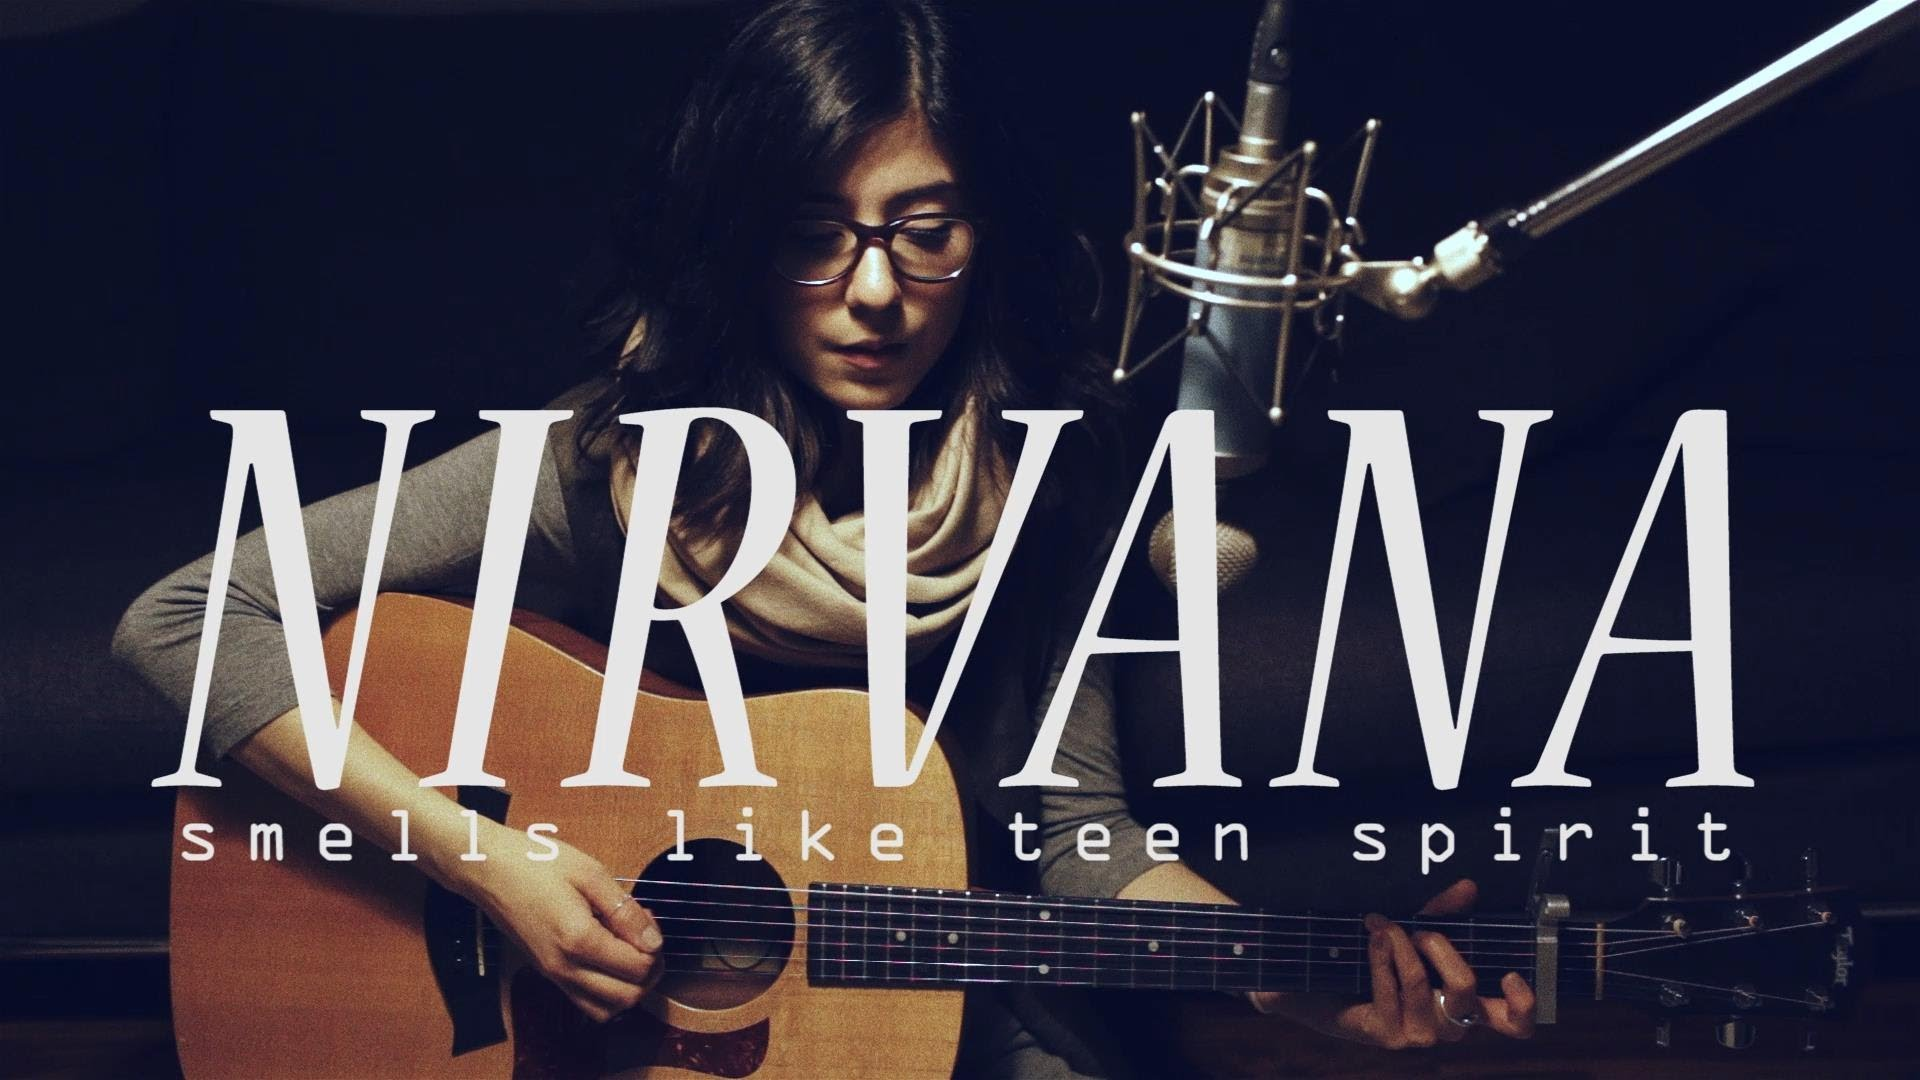 Smells like teen spirit image Nirvana - Smells Like Teen Spirit (Cover) by Daniela Andrade - YouTube image